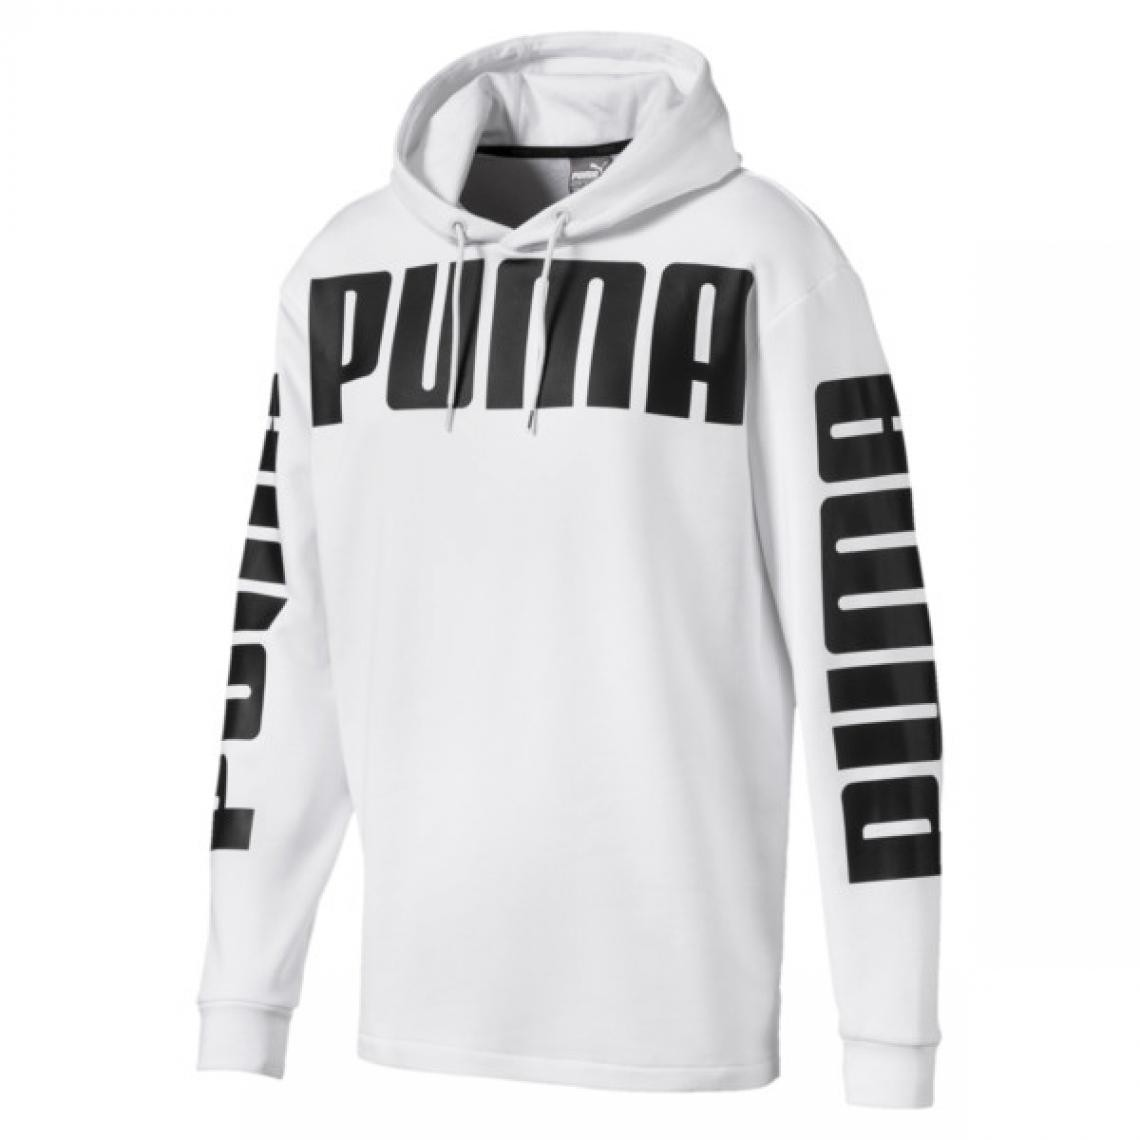 sweatshirts puma homme blanc